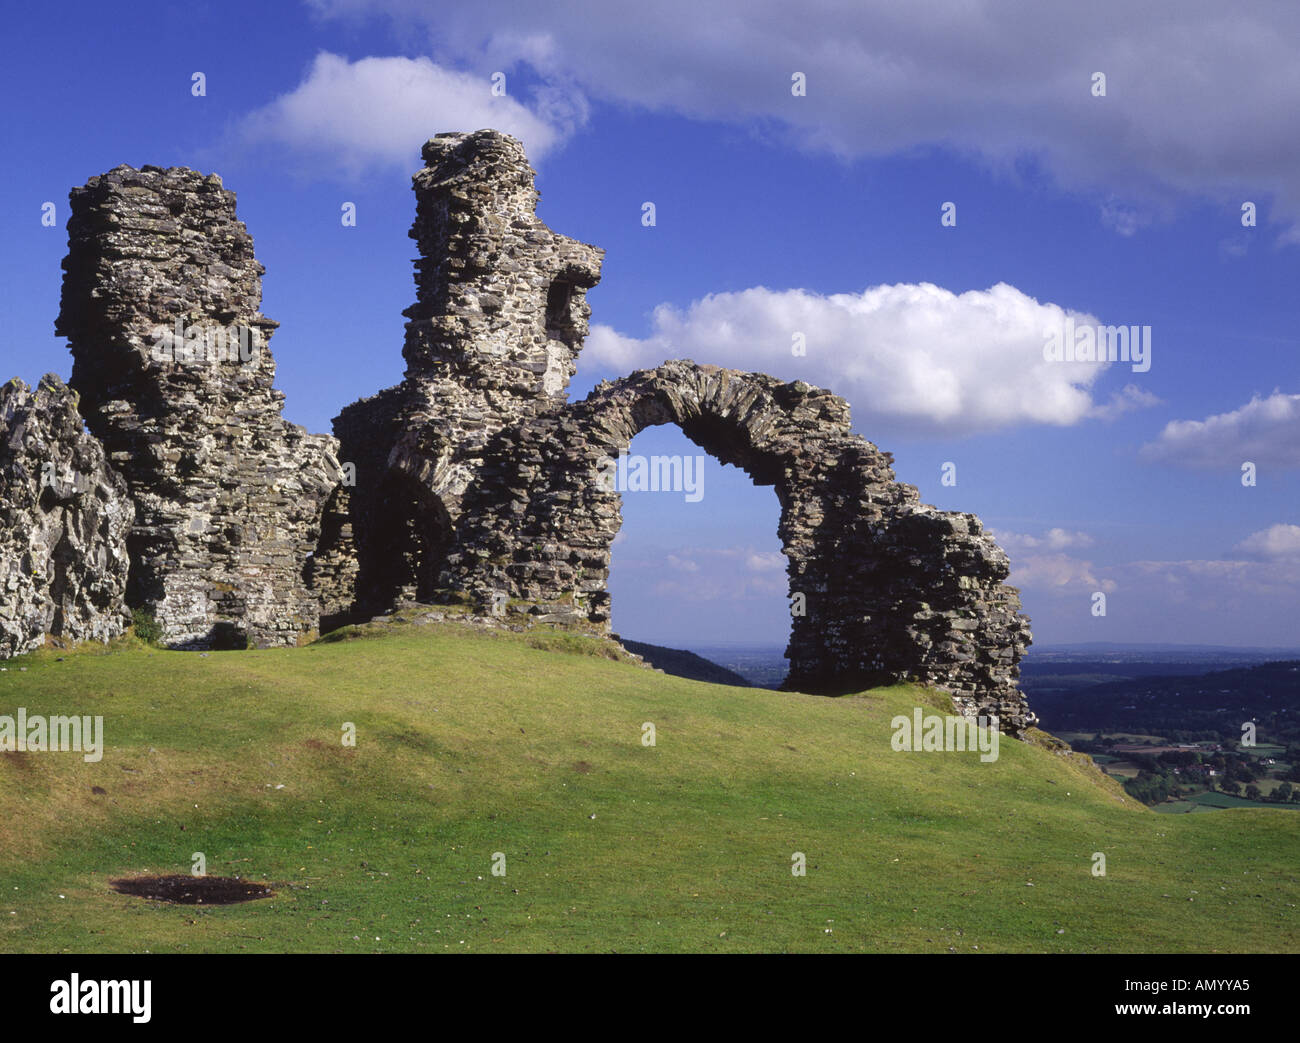 Part of Castell Dinas Bran Llangollen Clwyd Wales - Stock Image